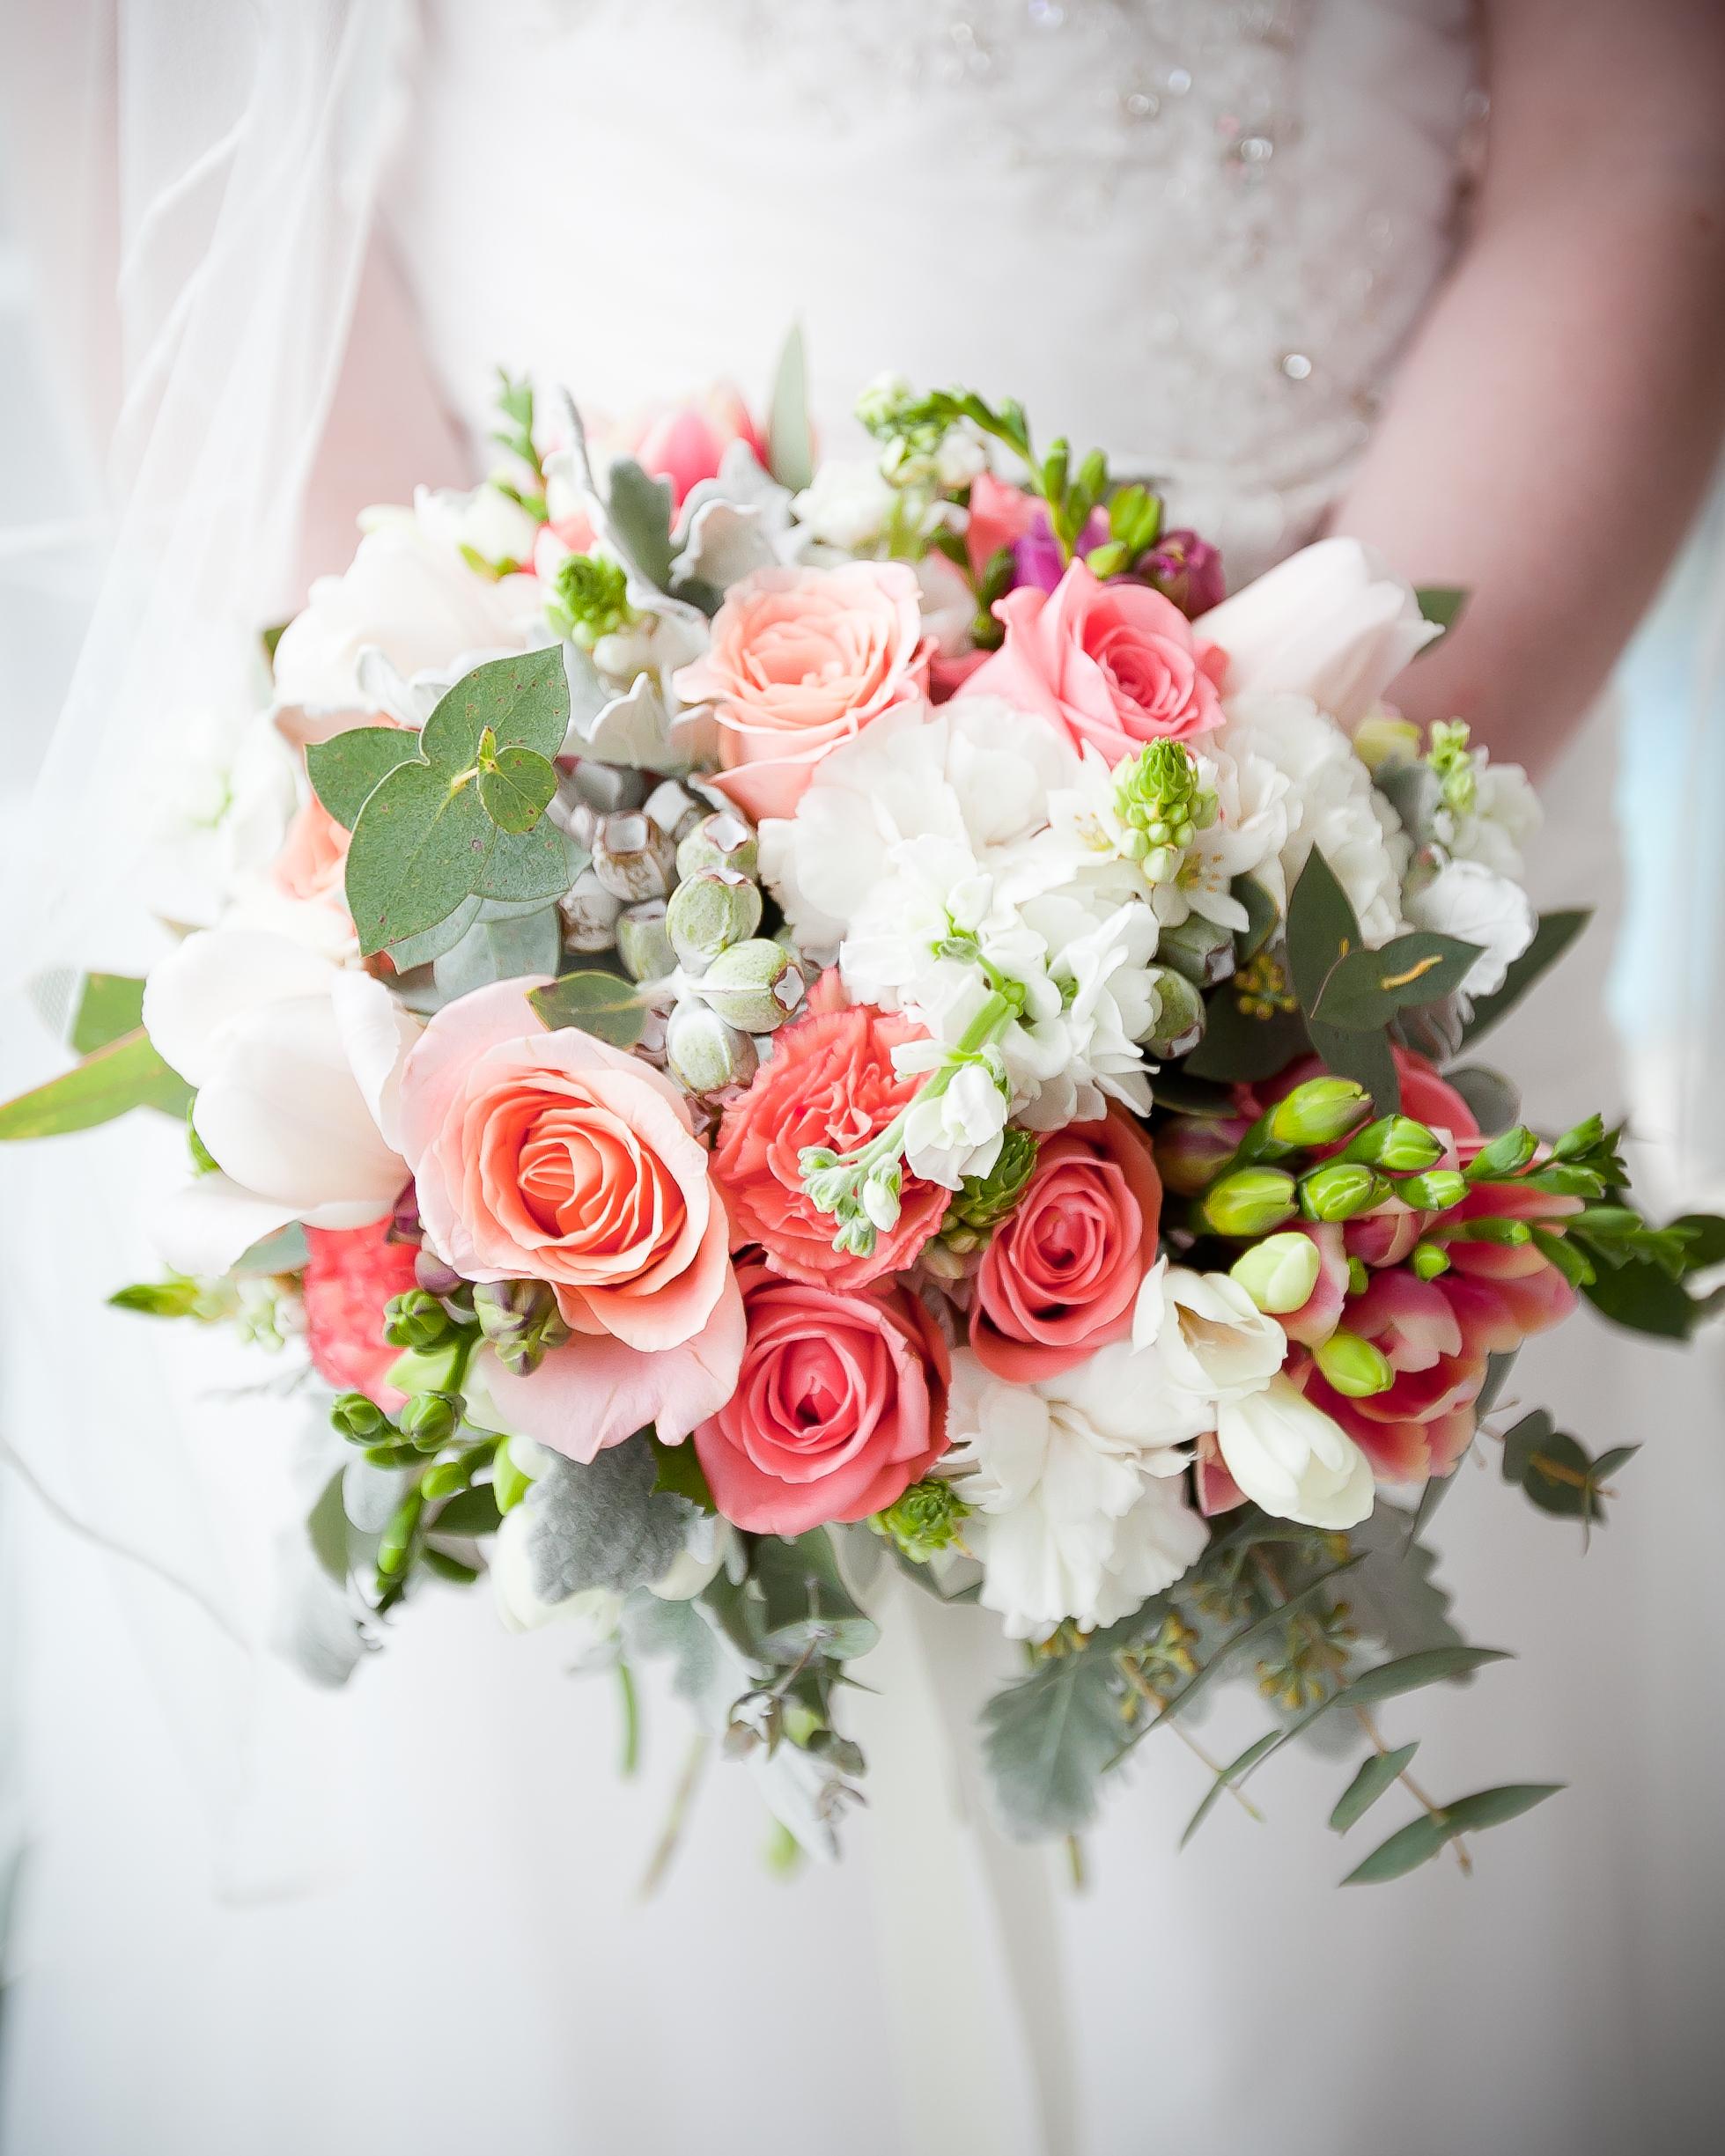 Coral and Pink Wedding Flowers  Brisbane Wedding Florist  Blossom  Twine